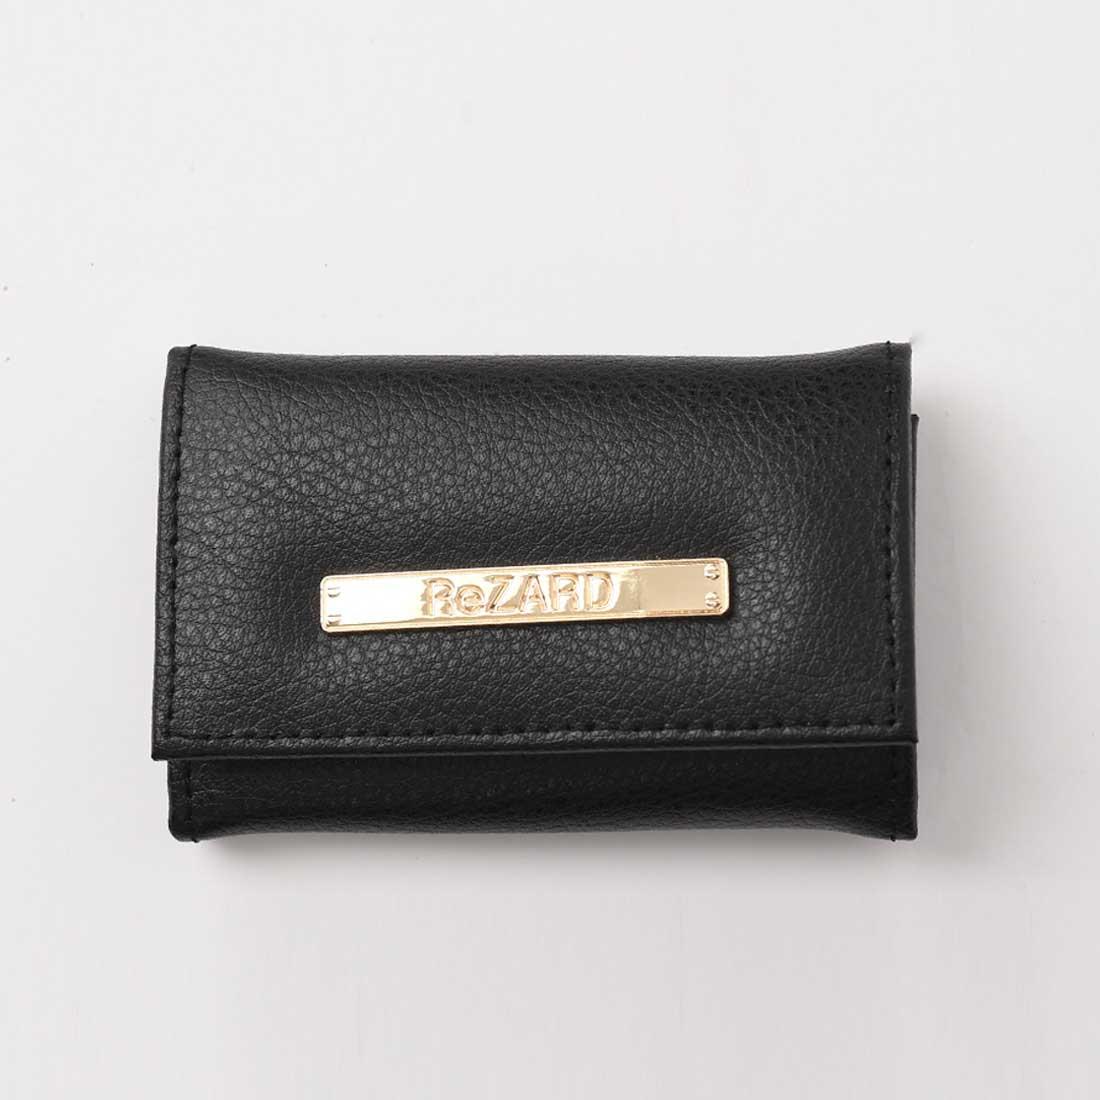 【ReZARD】Metal plate Leather Key case